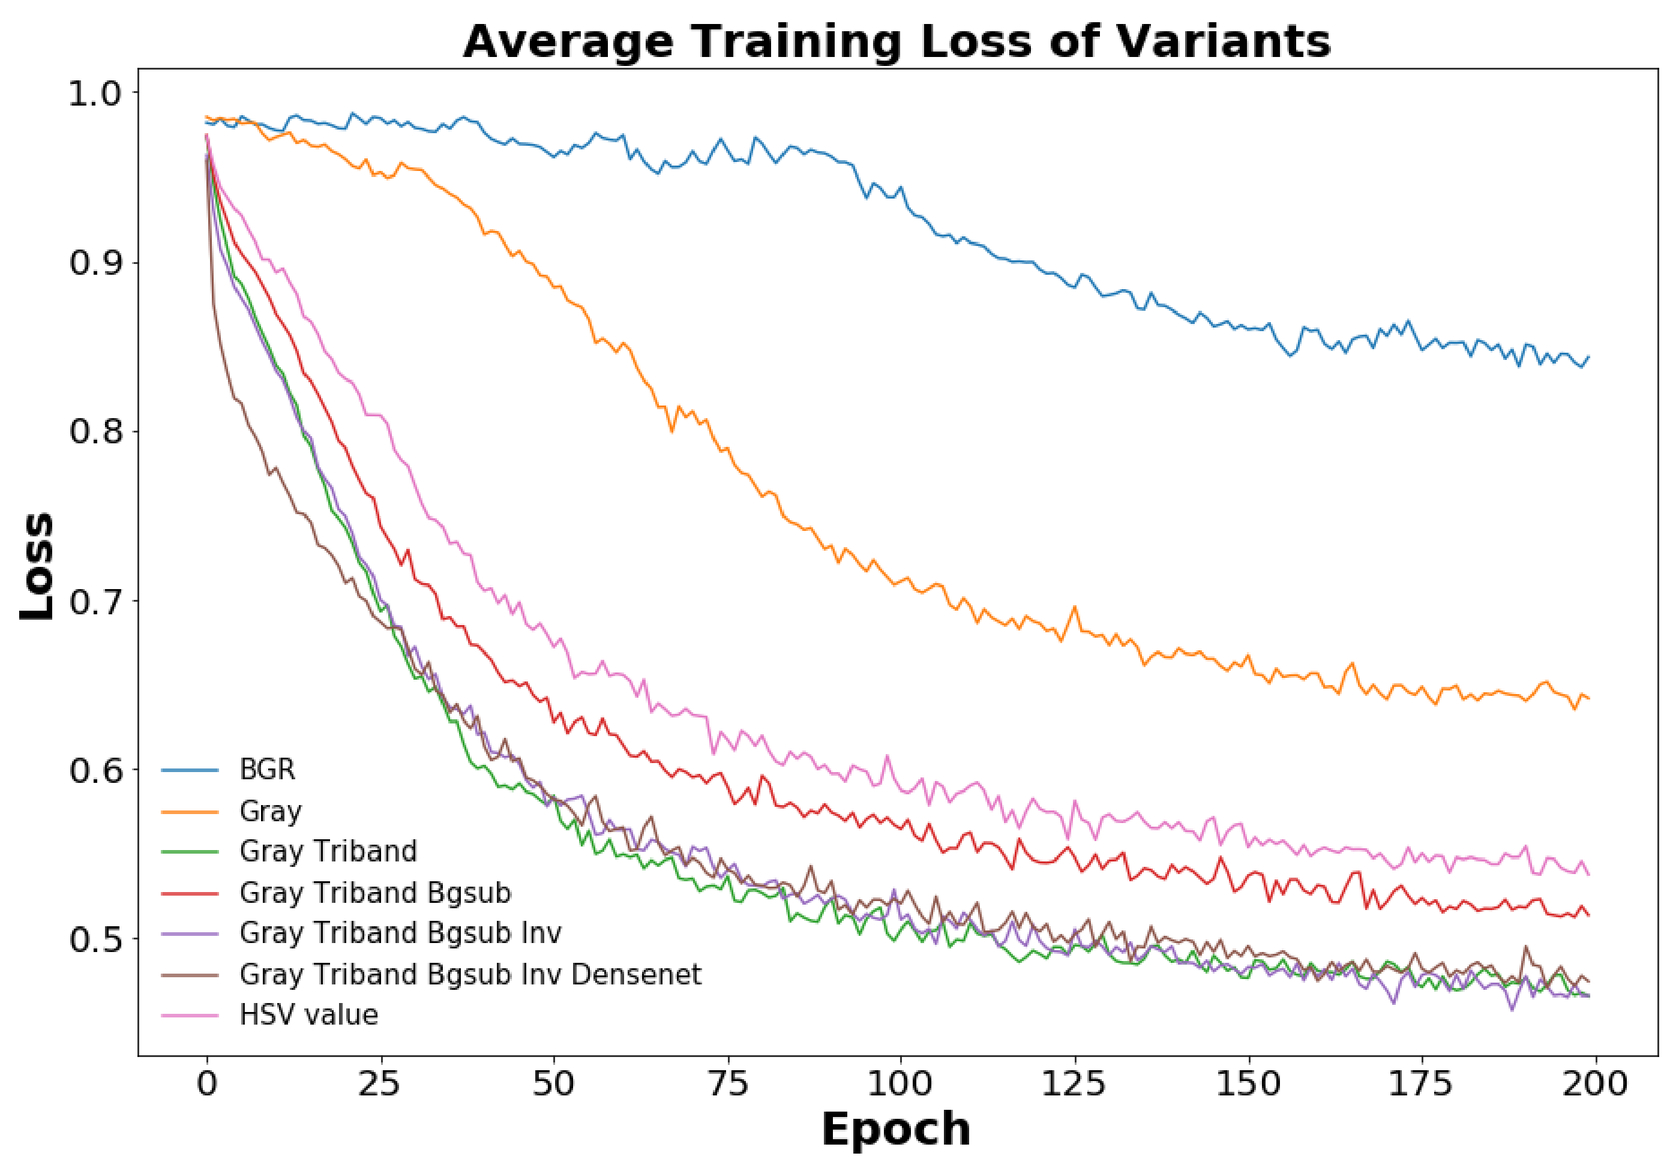 Comparison of various neural network-based models for